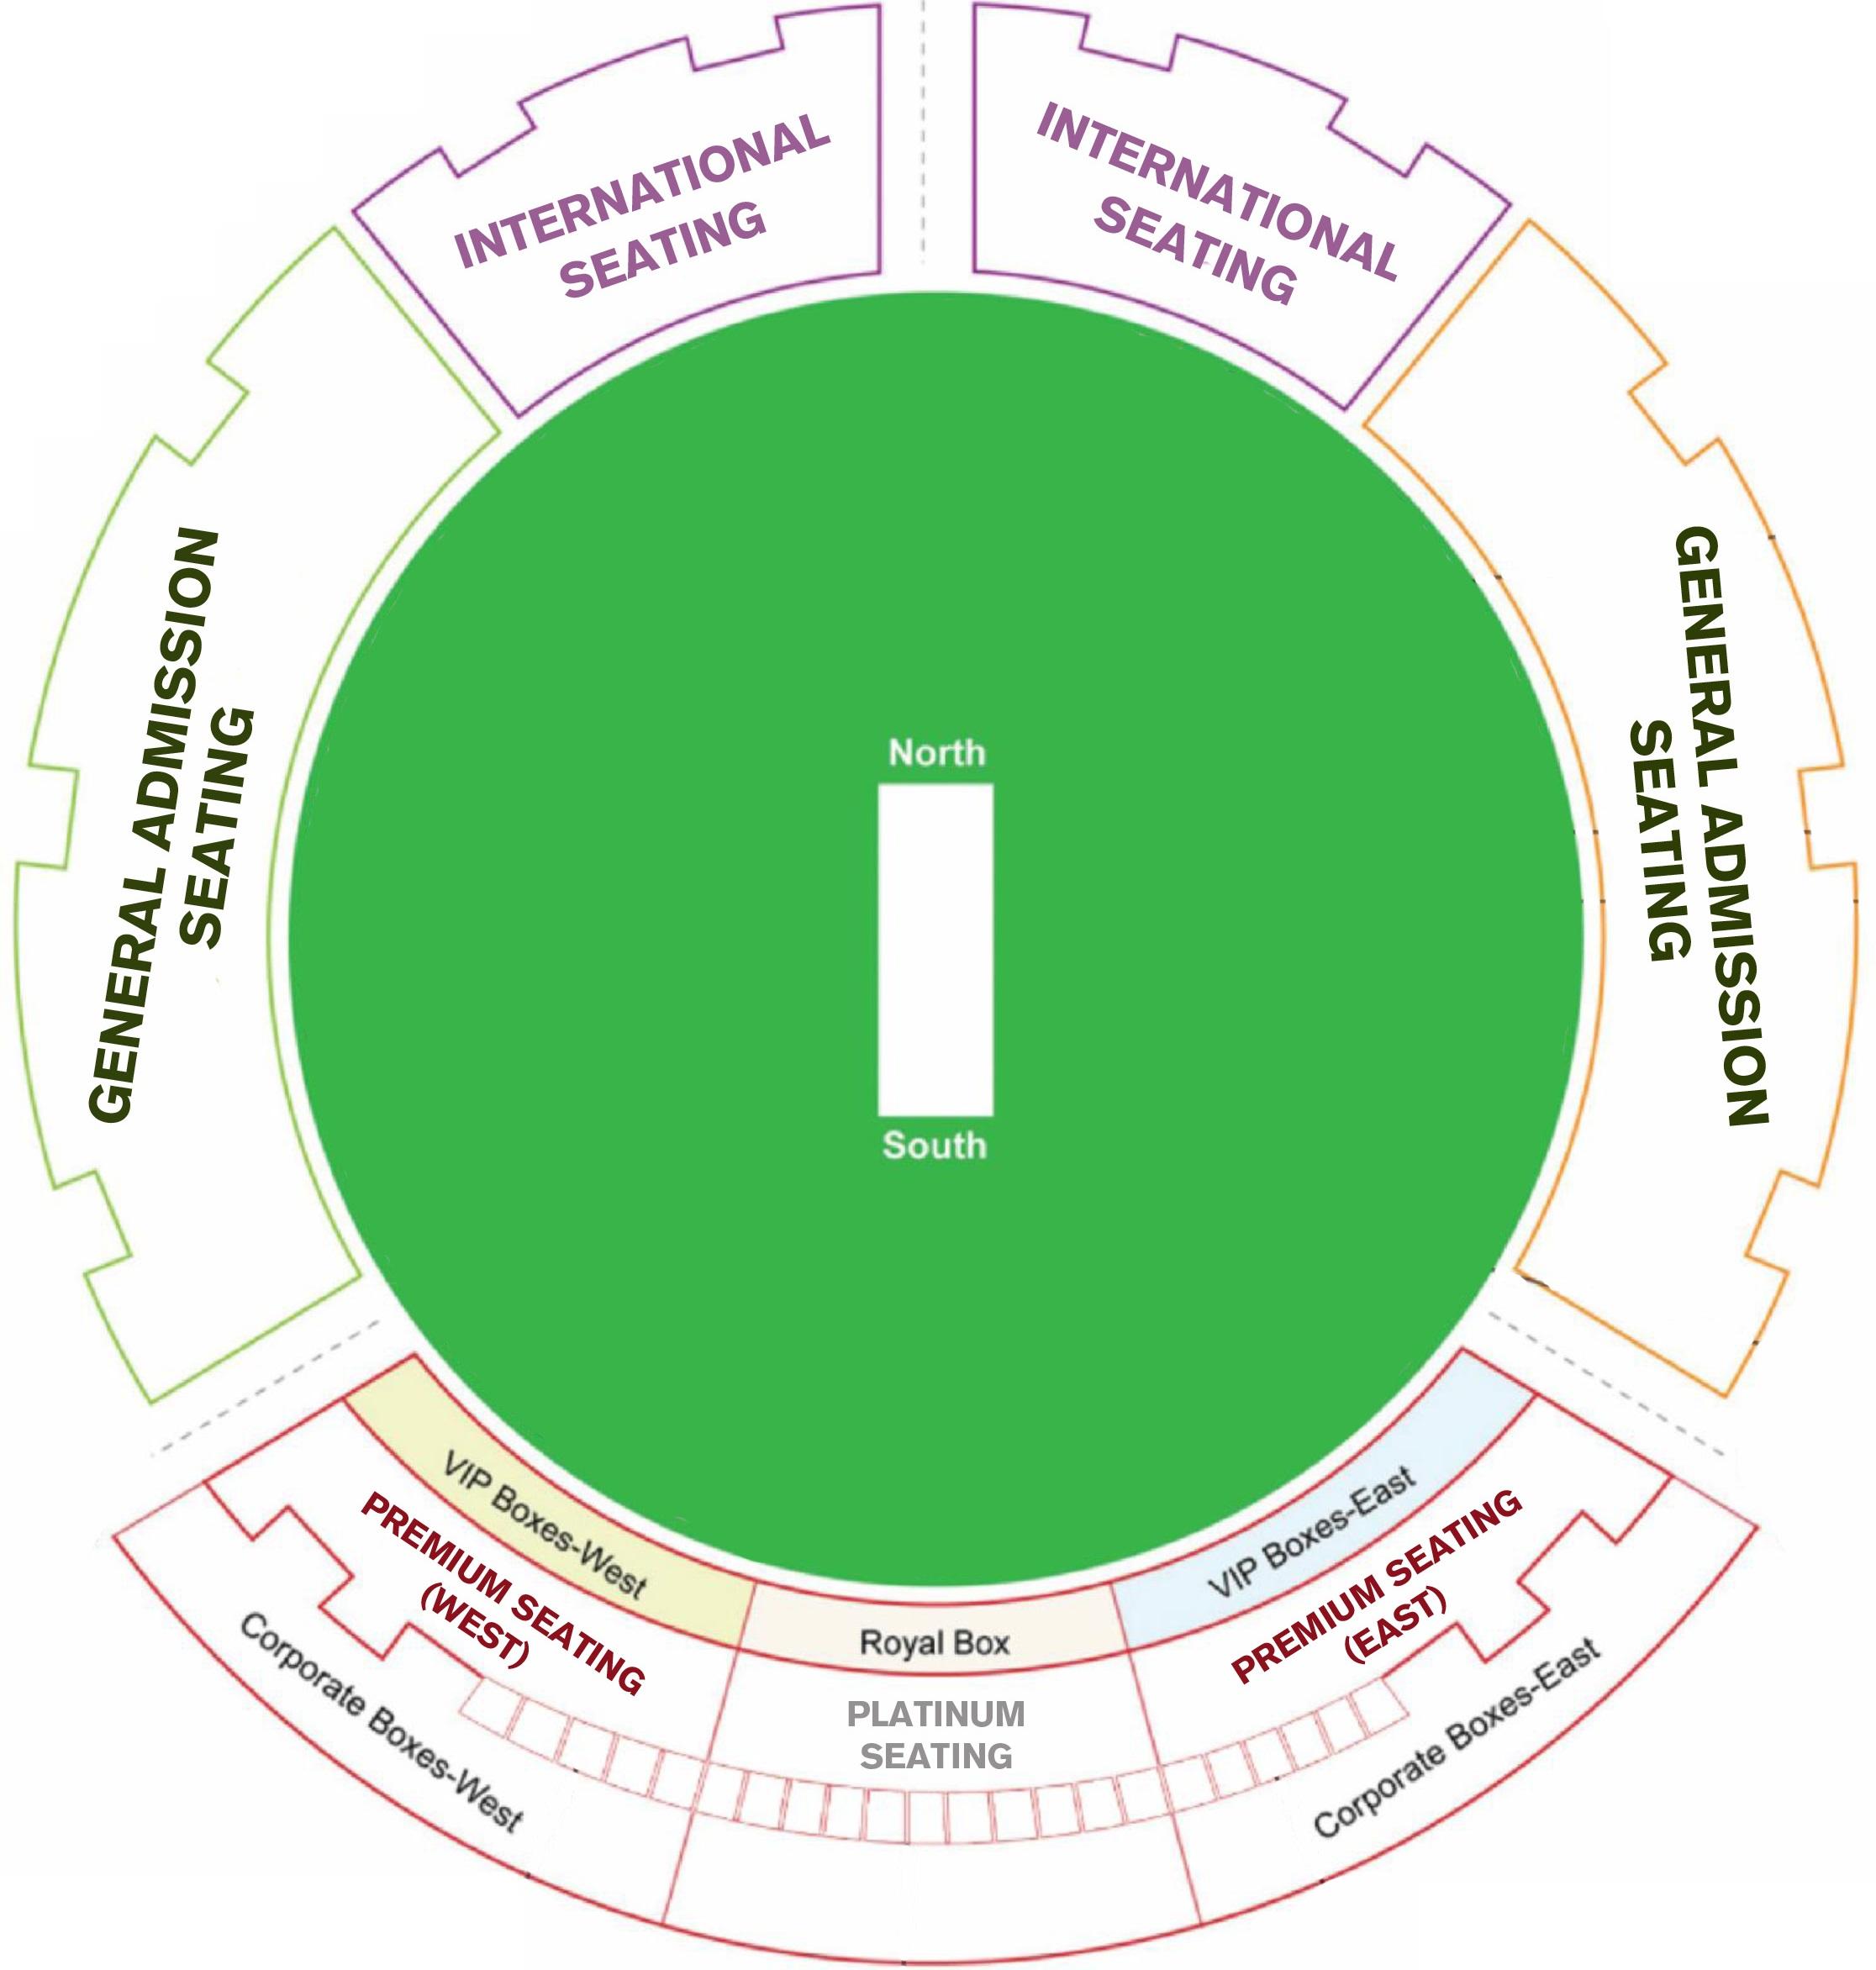 Dubai International Cricket Stadium Seating Plan